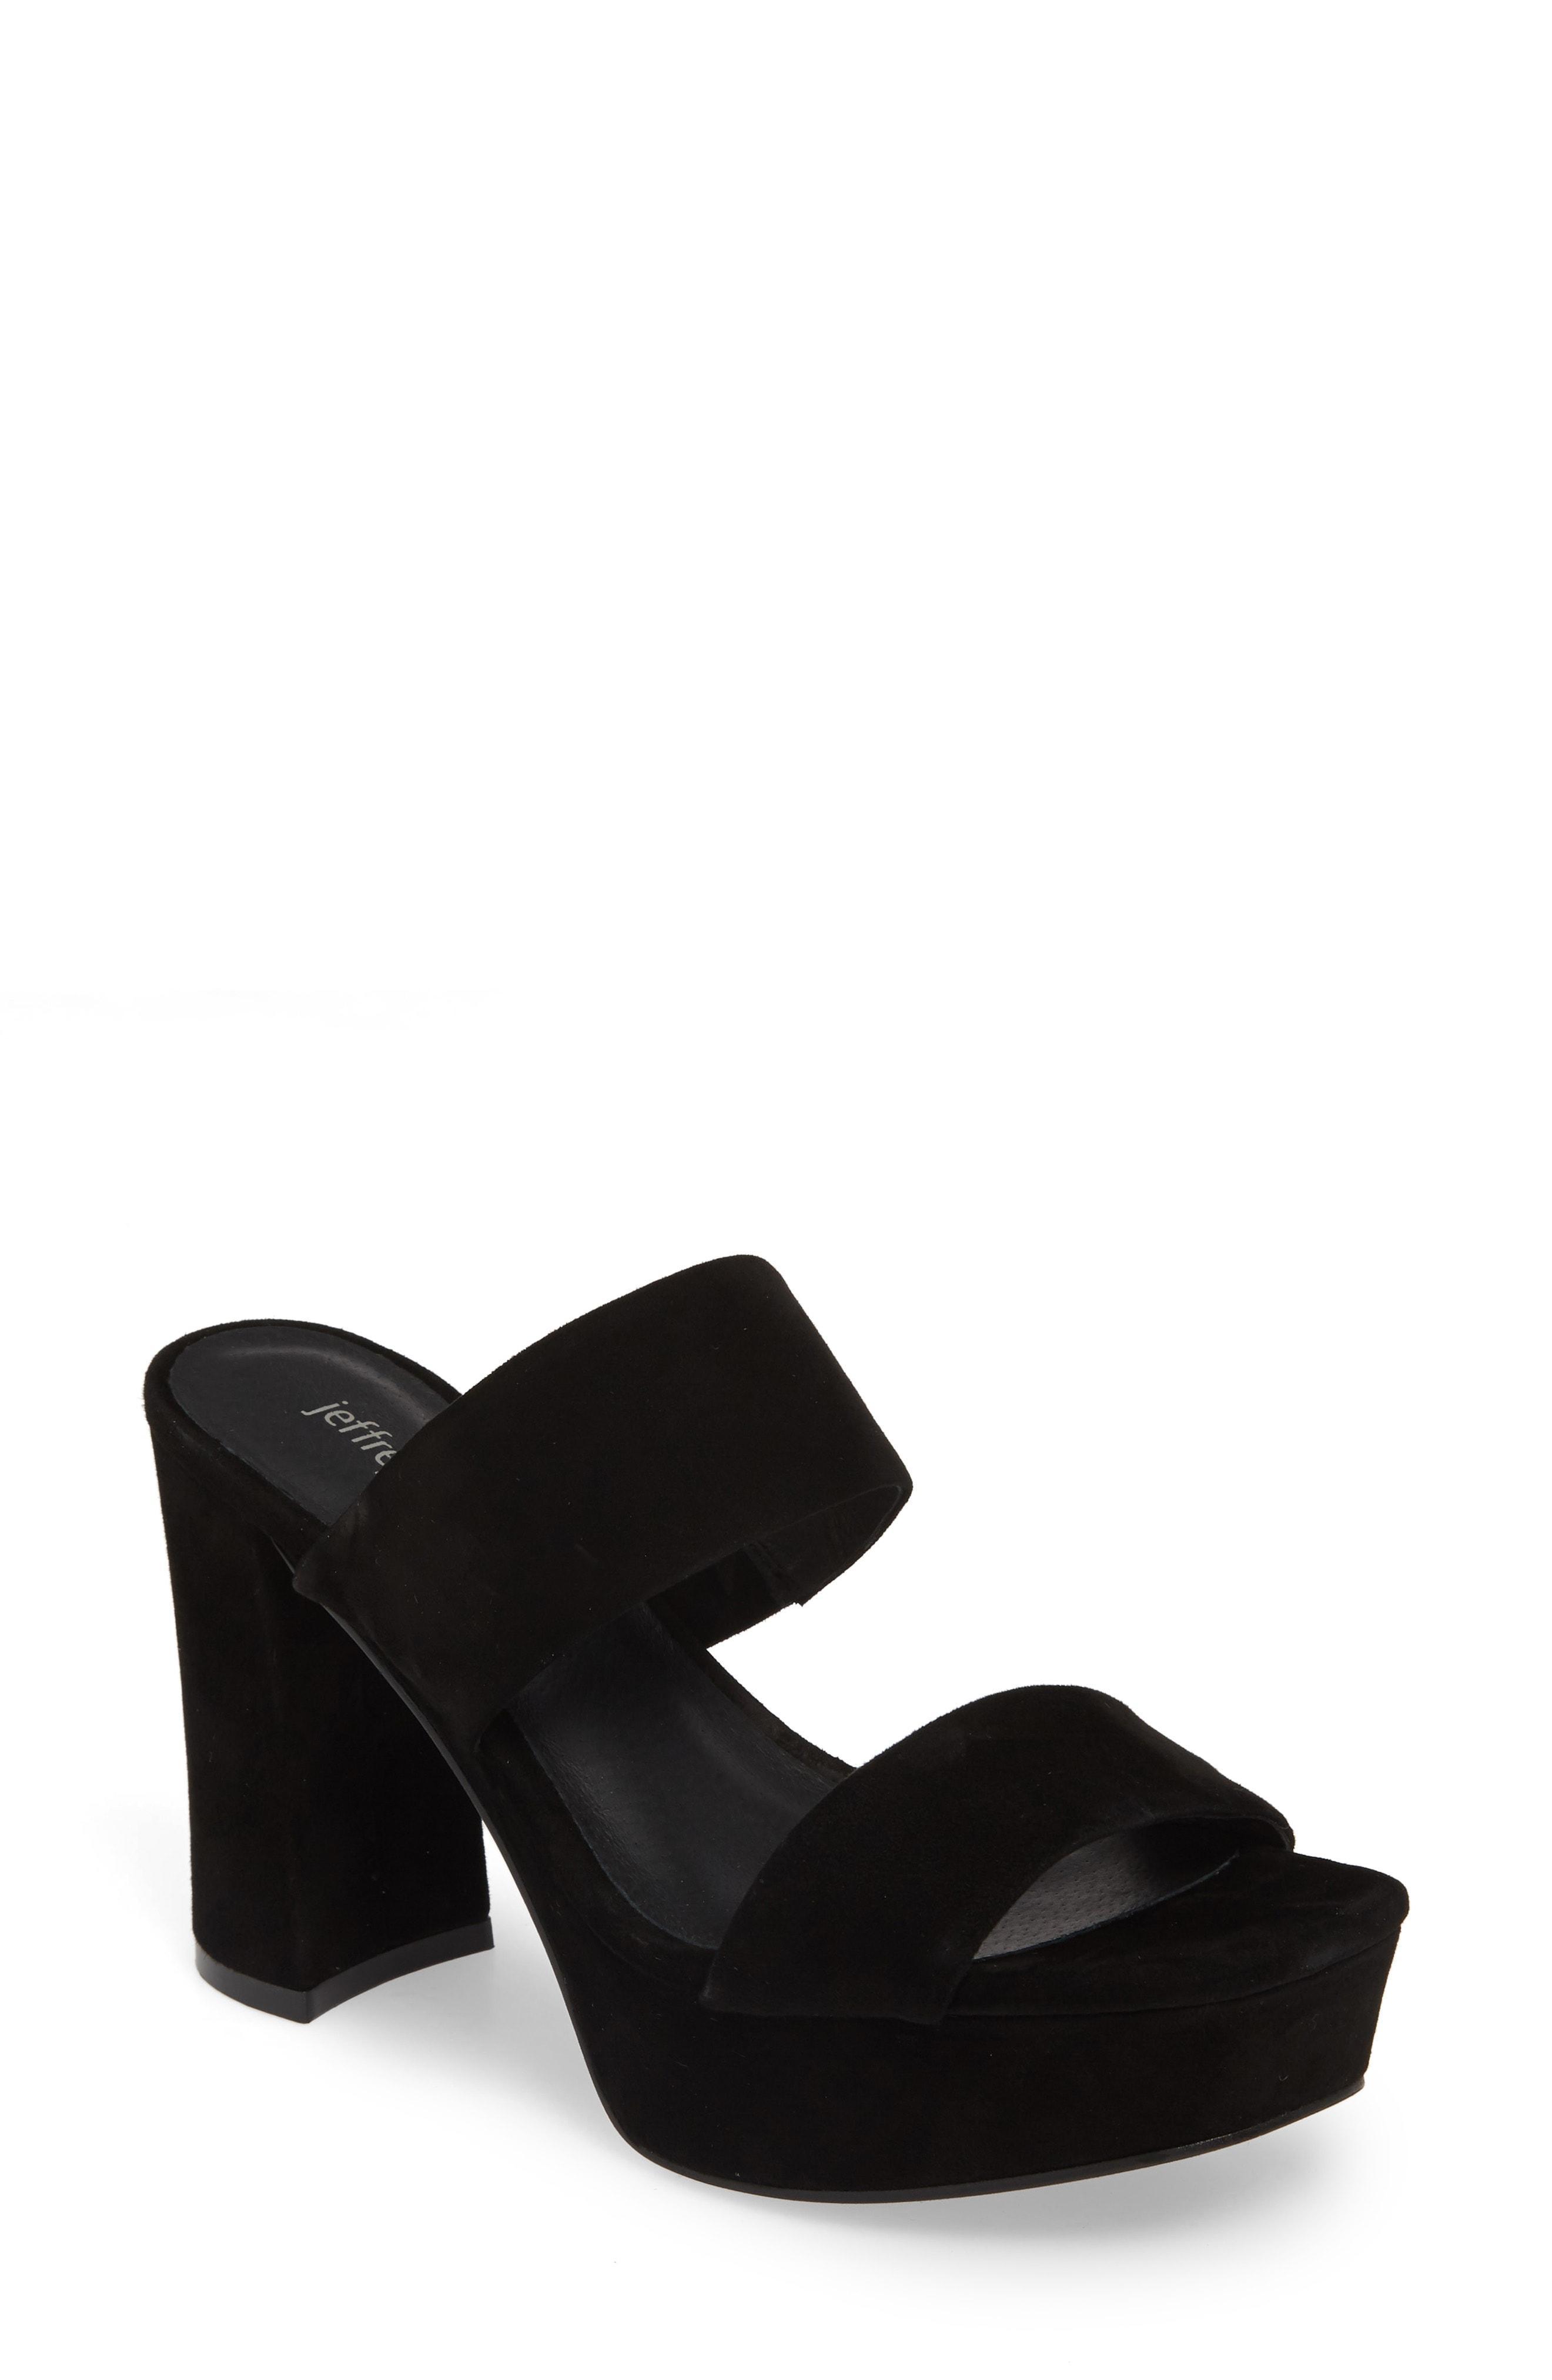 576e170d584a Jeffrey Campbell Adriana-2 Platform Slide Sandal in Black - Lyst